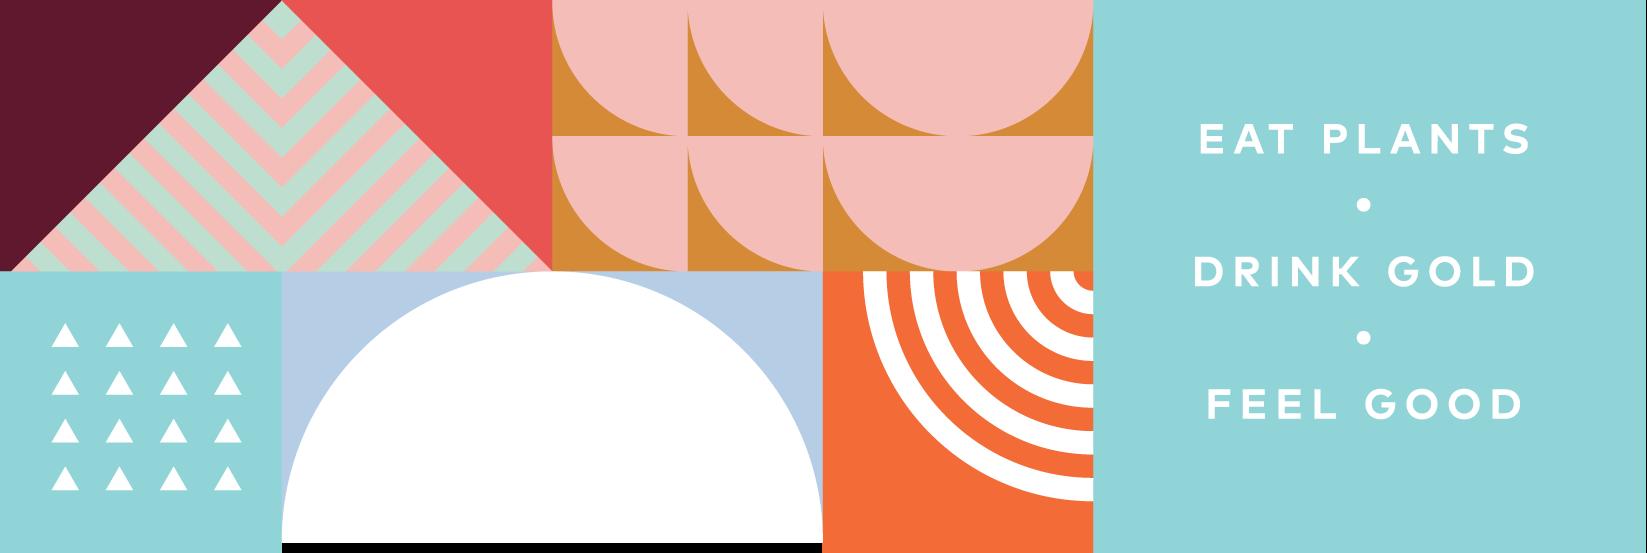 h-pattern-tagline.png